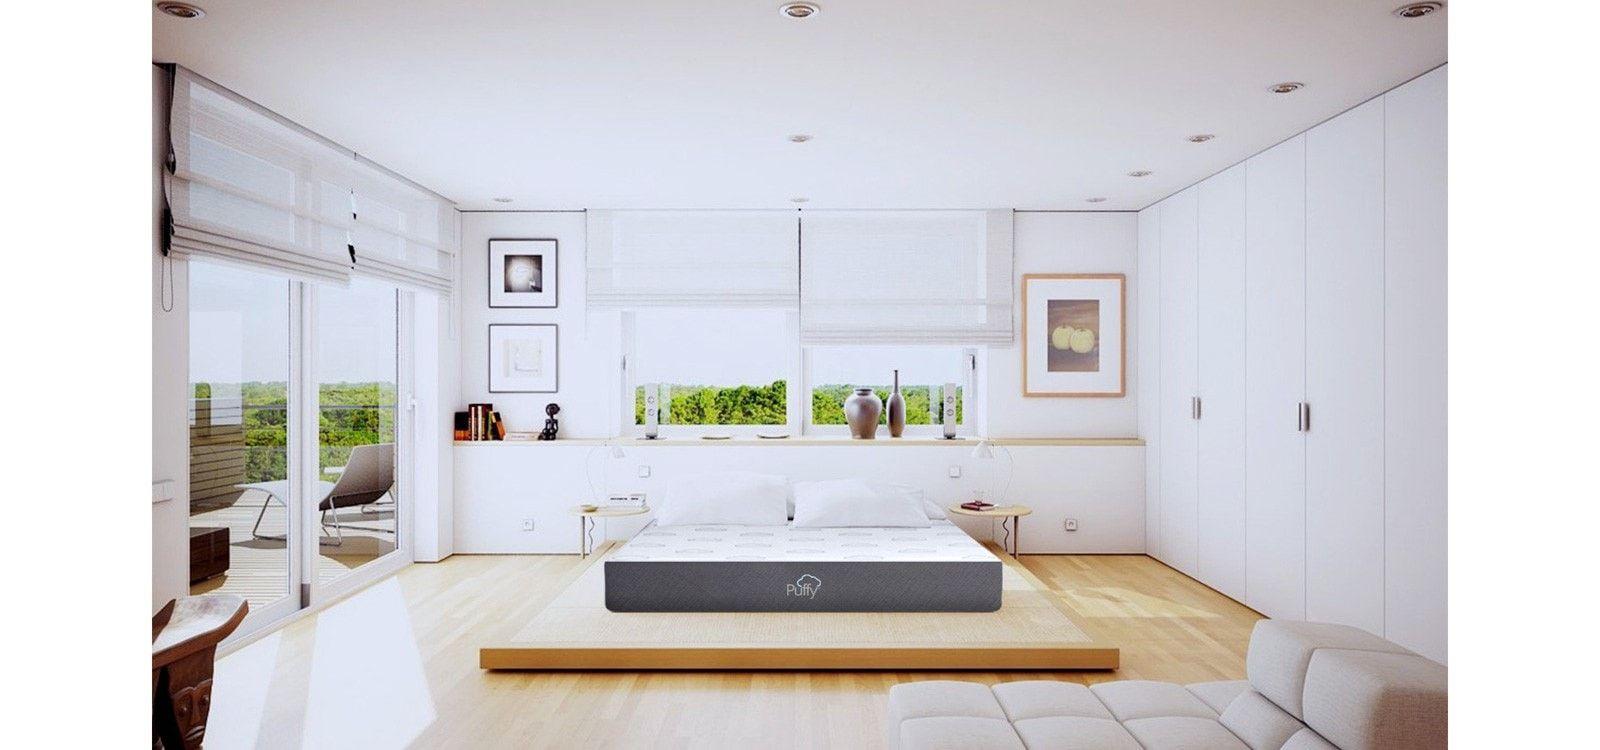 The Puffy Mattress   Home: Design-Mid Century Modern   Pinterest ...